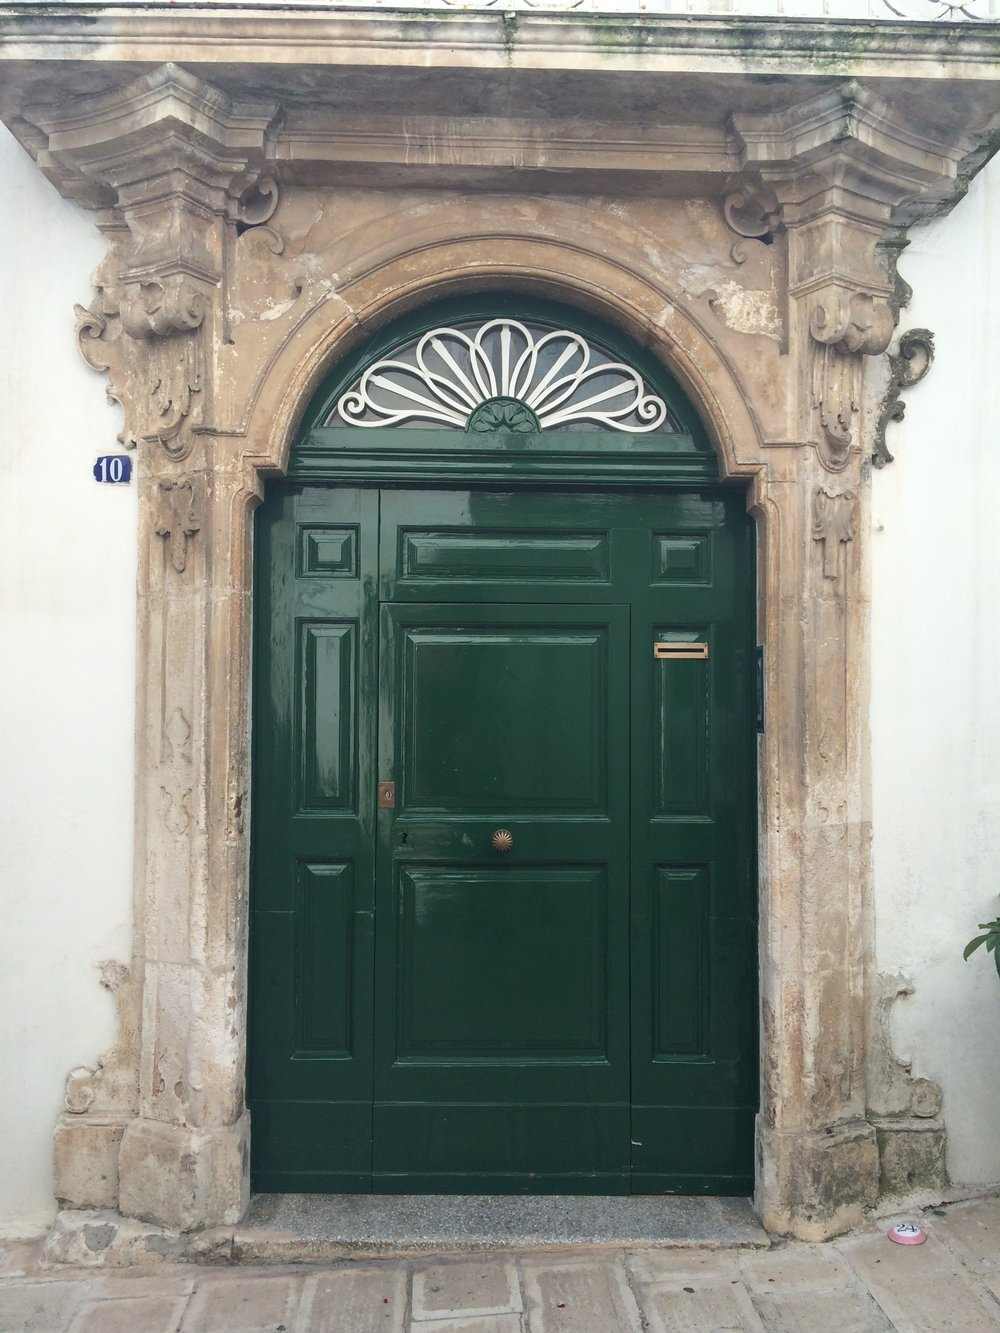 Martina Franca, Puglia, Italy.